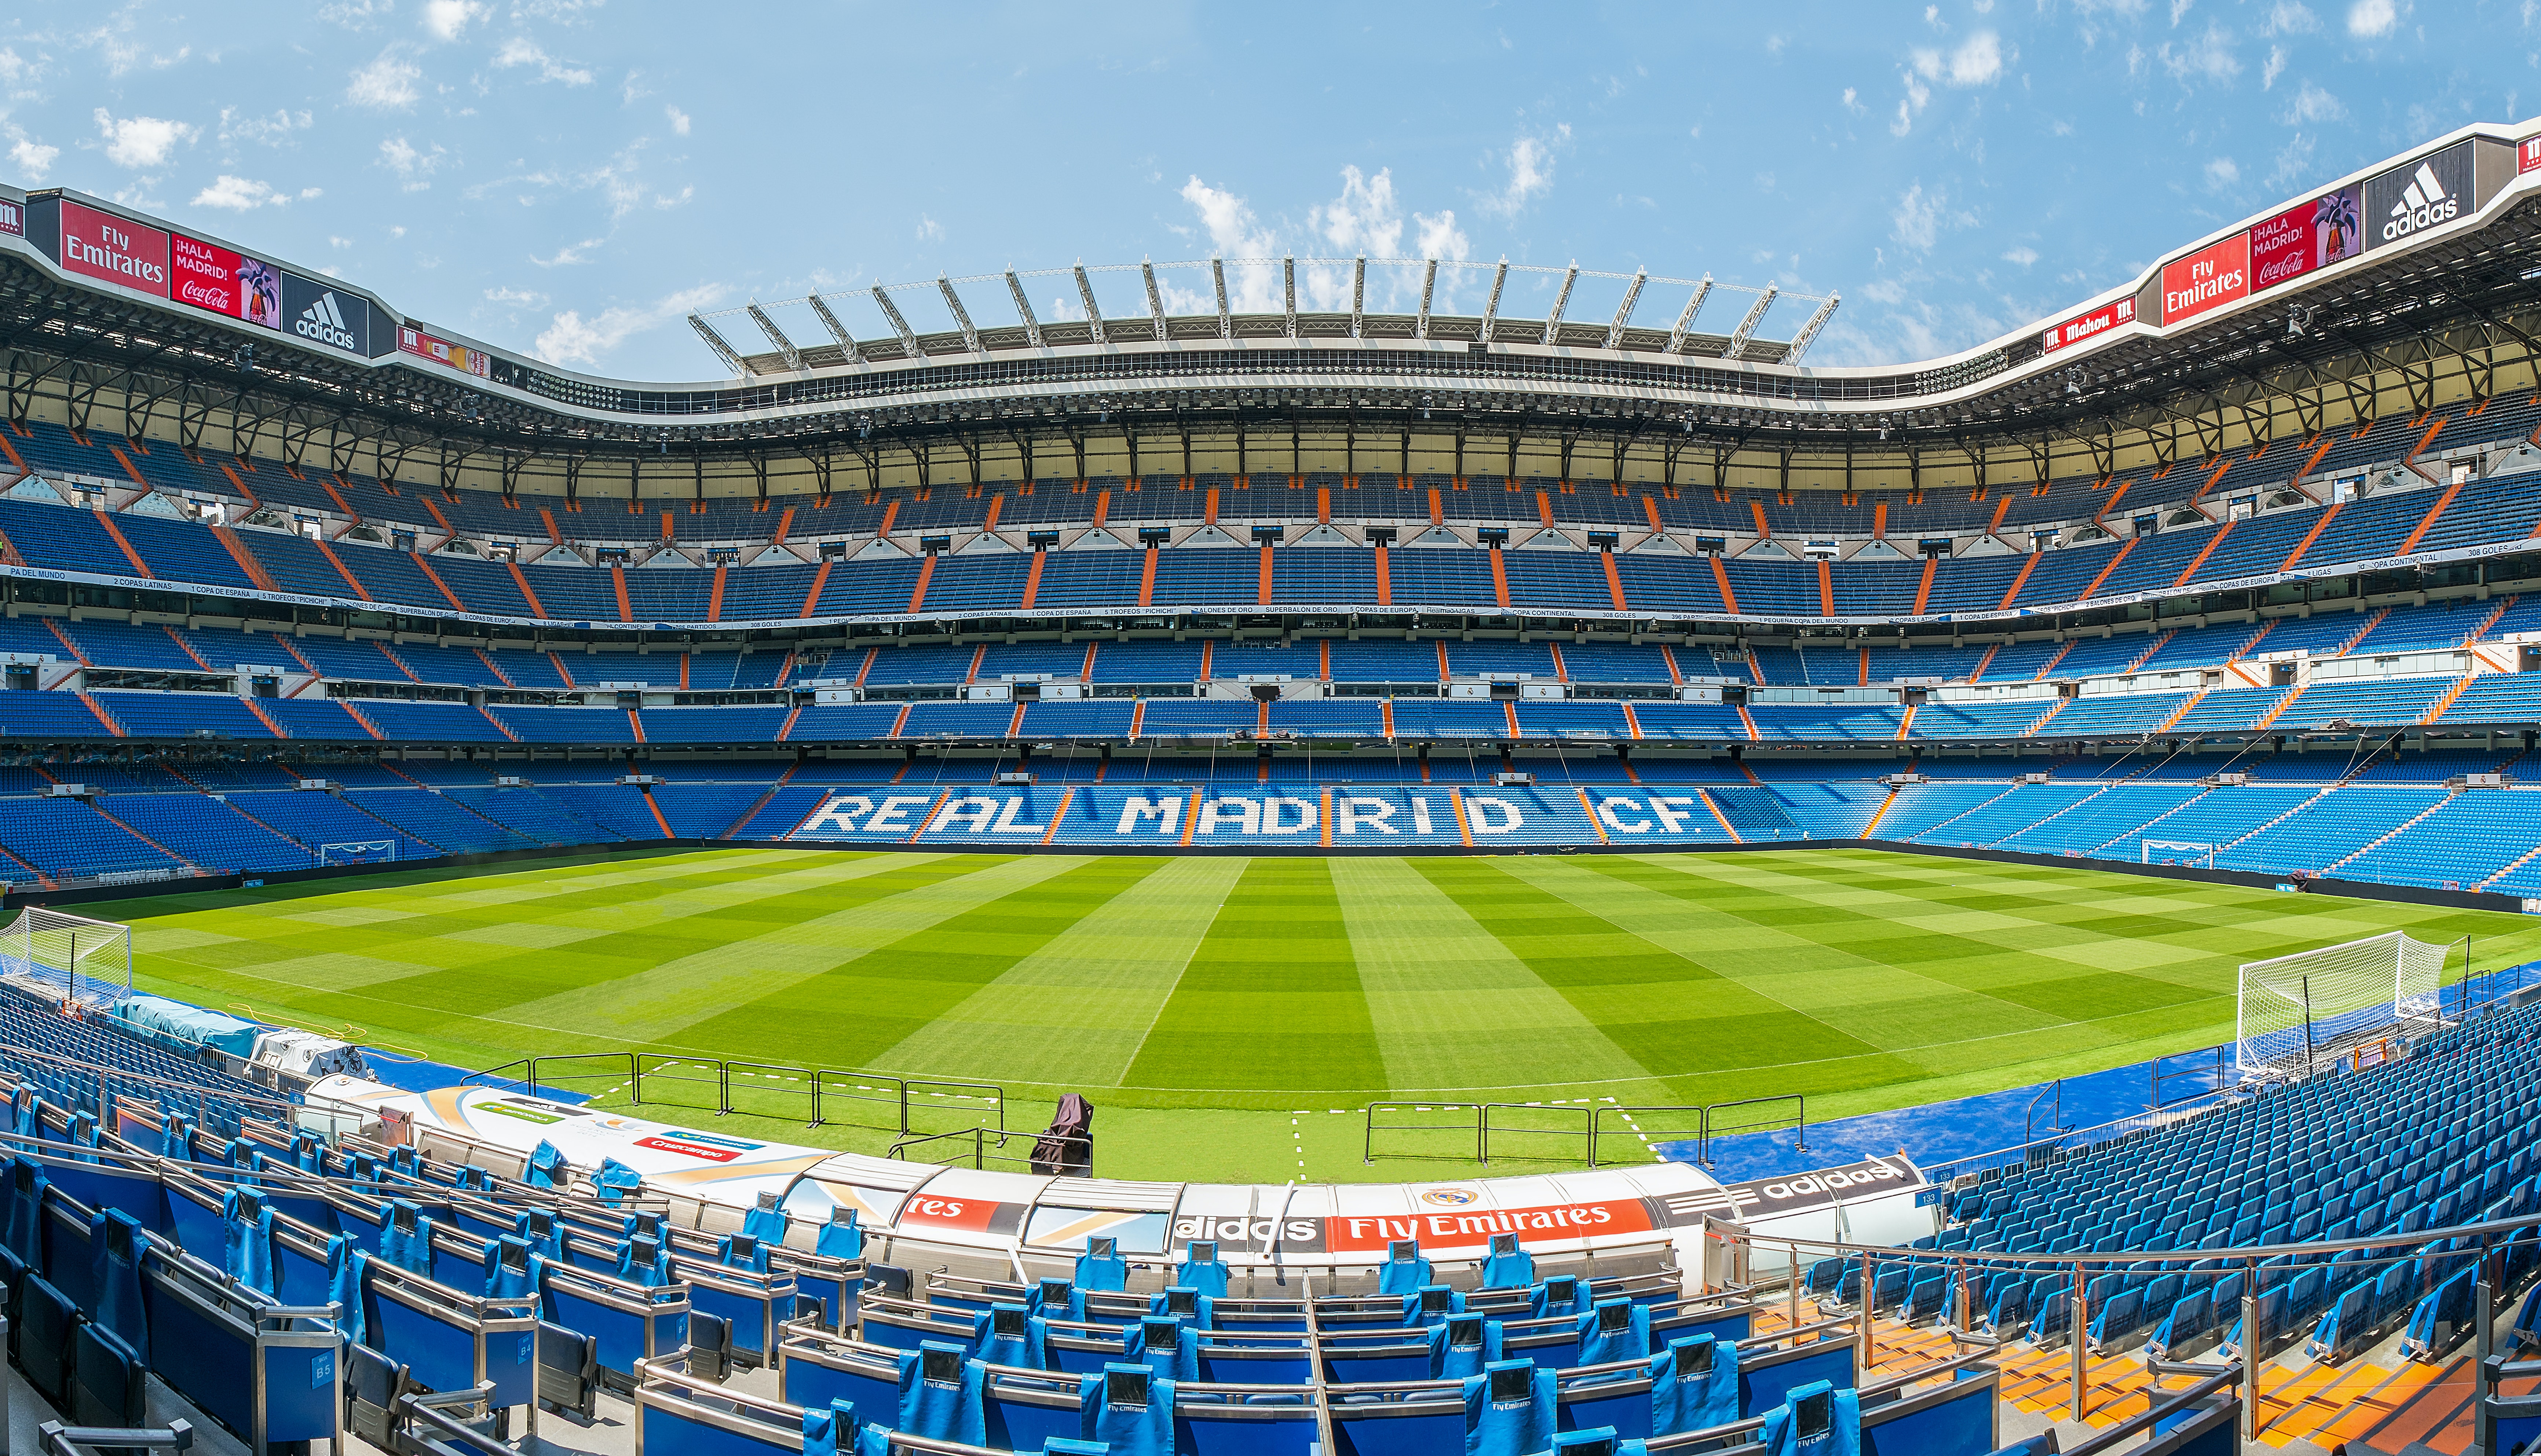 Santiago bernabeu stadion madrid tiqets for Puerta 38 santiago bernabeu